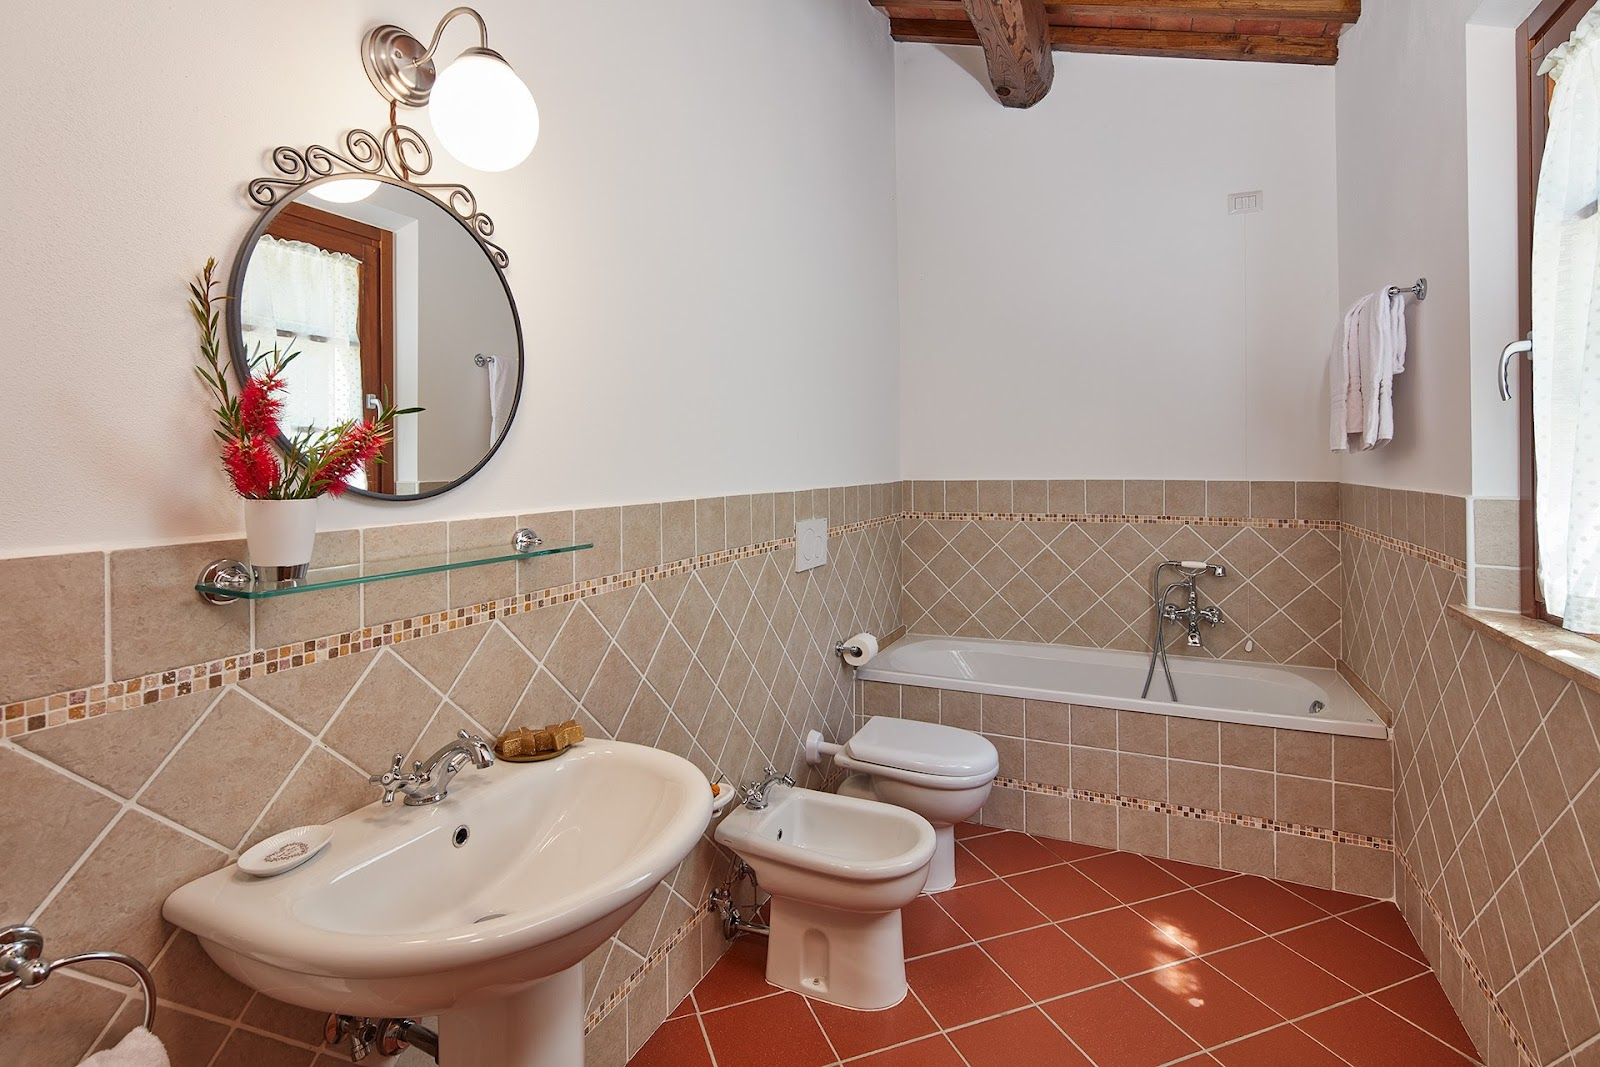 Ferienhaus Corte Paradiso (2570342), Monsummano Terme, Pistoia, Toskana, Italien, Bild 26